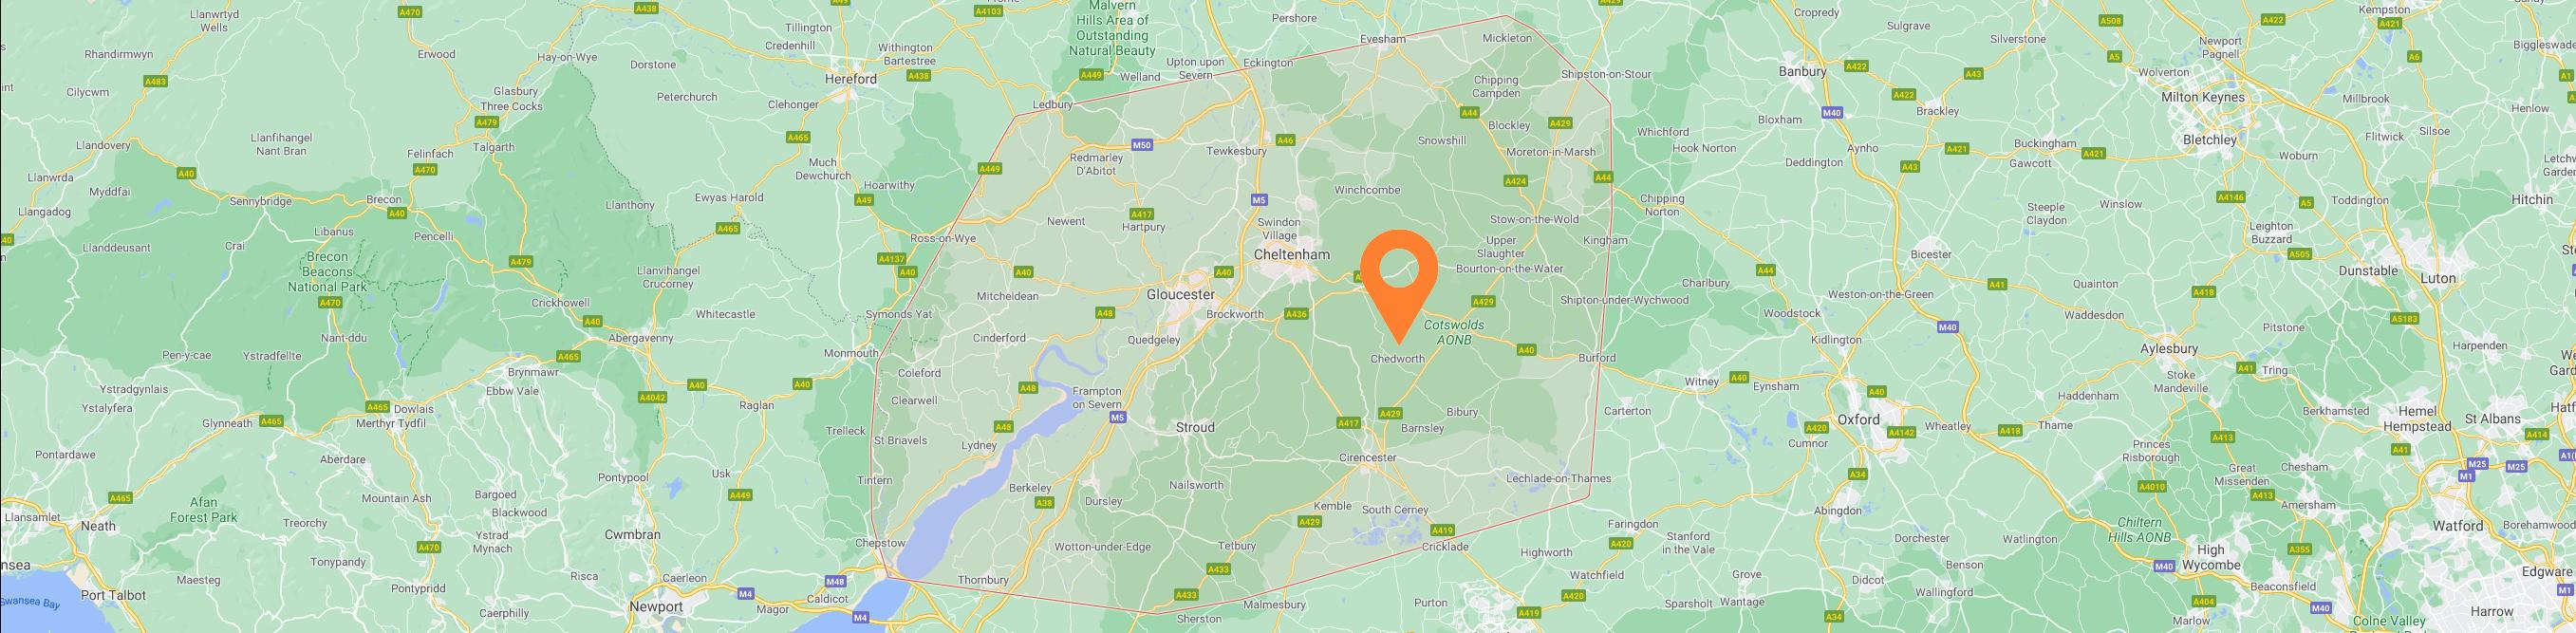 Corinium Arb - We are Here - Google Gloucestershire Map